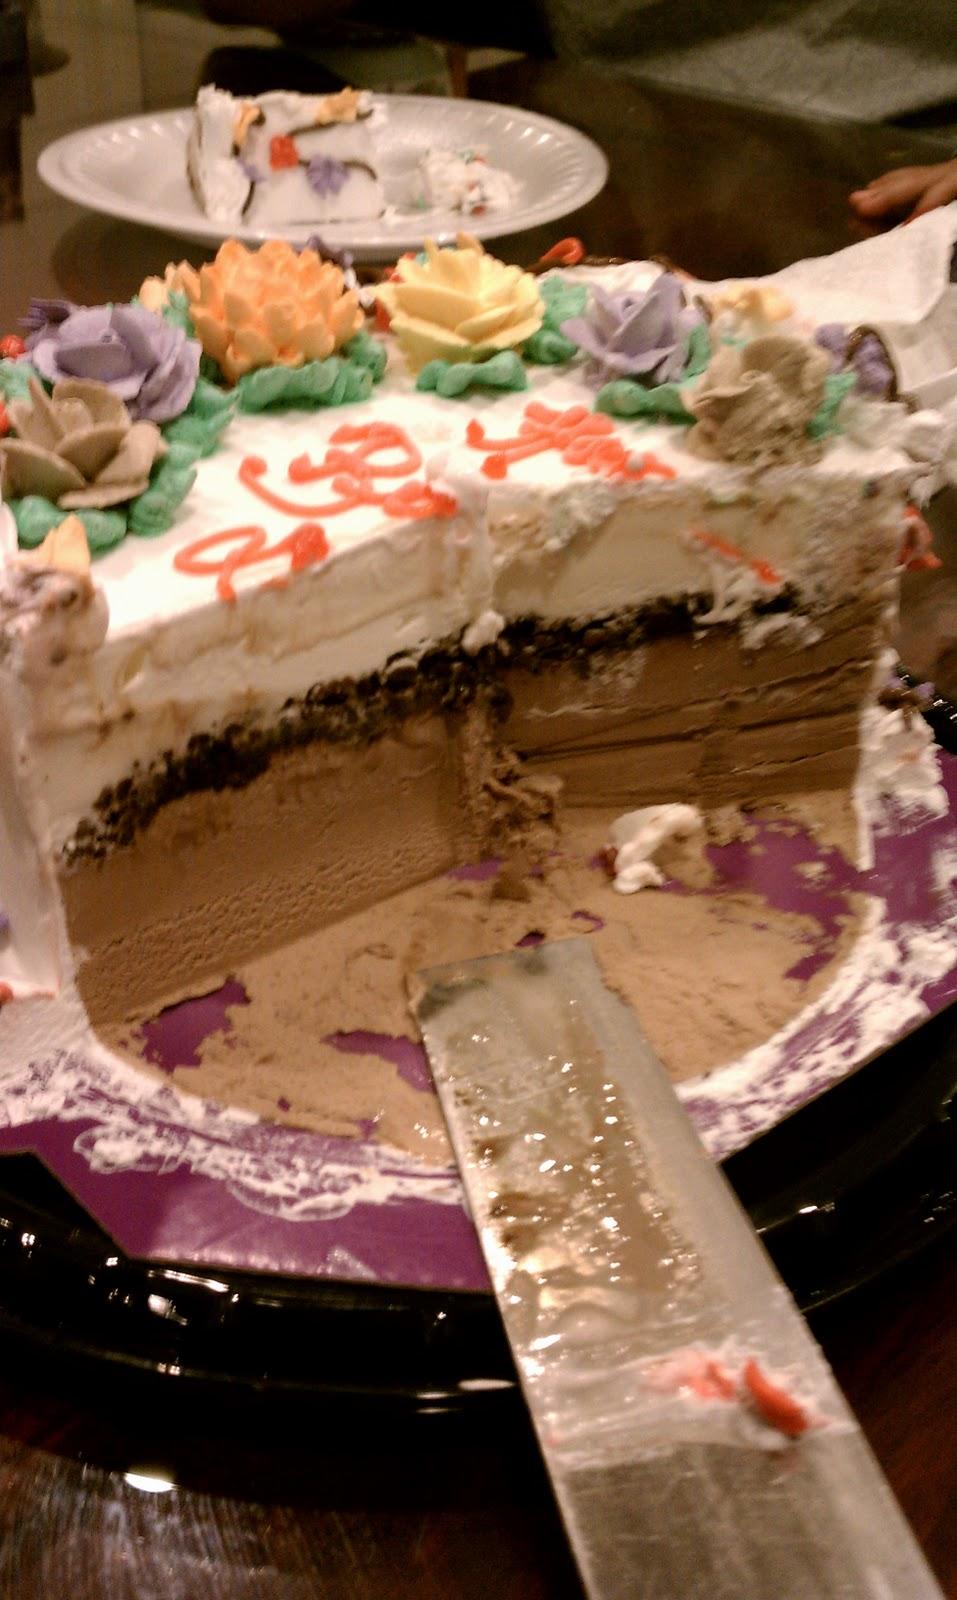 Tasty Eating Carvel Ice Cream Cake